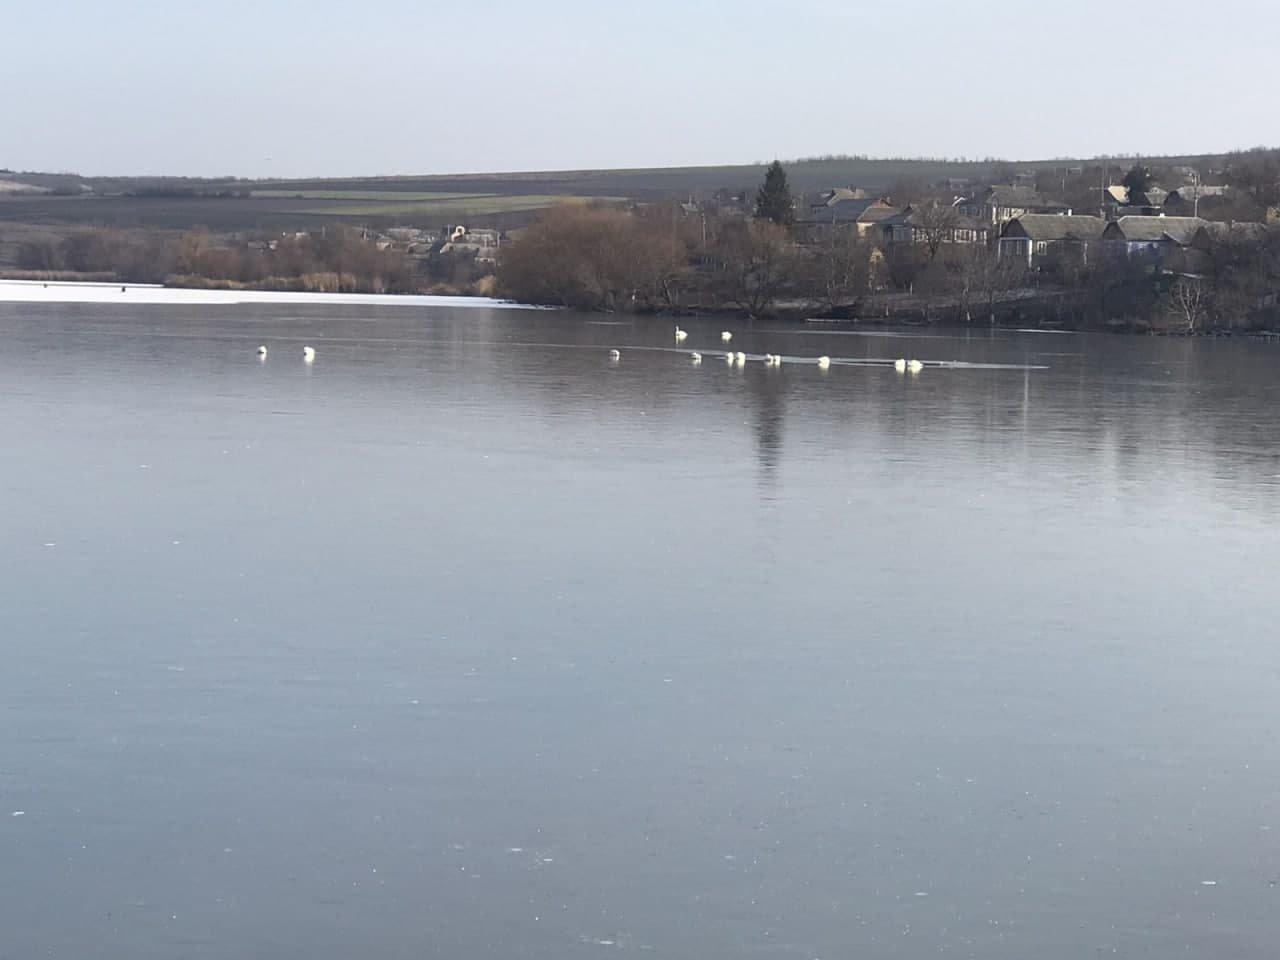 Спасатели в Одесской области освободили 16 лебедей от ледяного плена, - ФОТО, фото-2